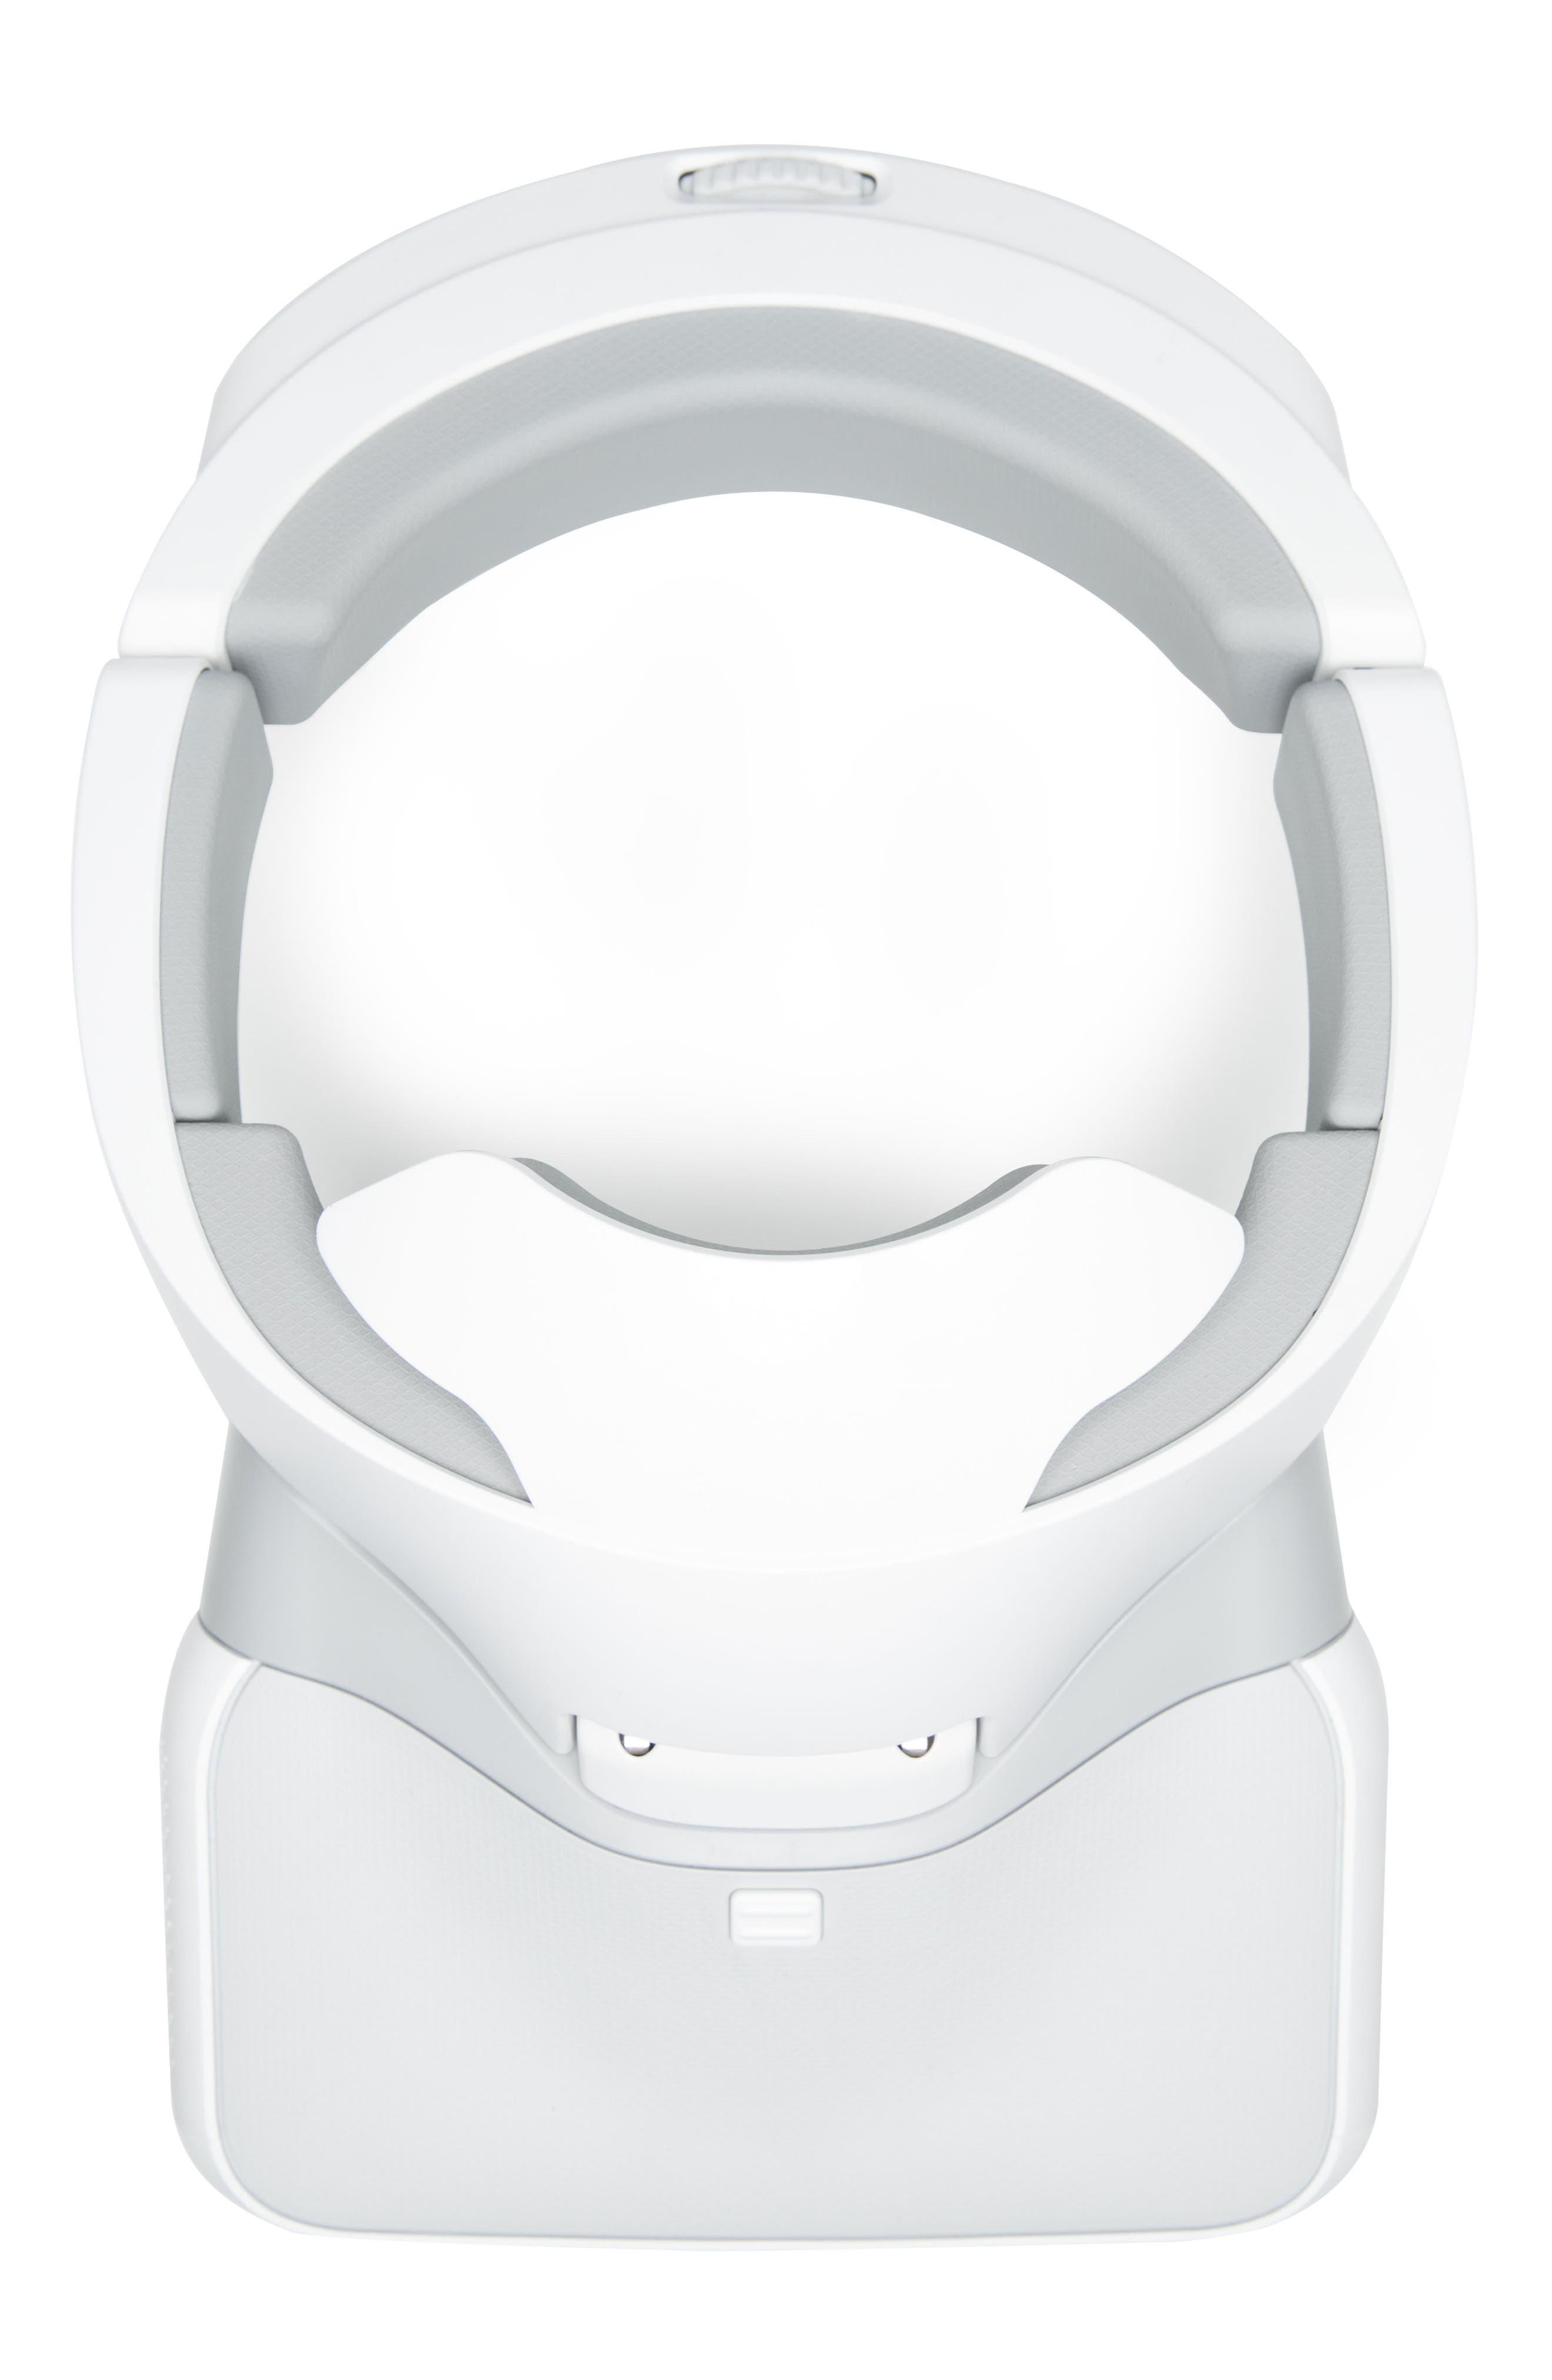 FPV Drone Goggles,                             Alternate thumbnail 3, color,                             White